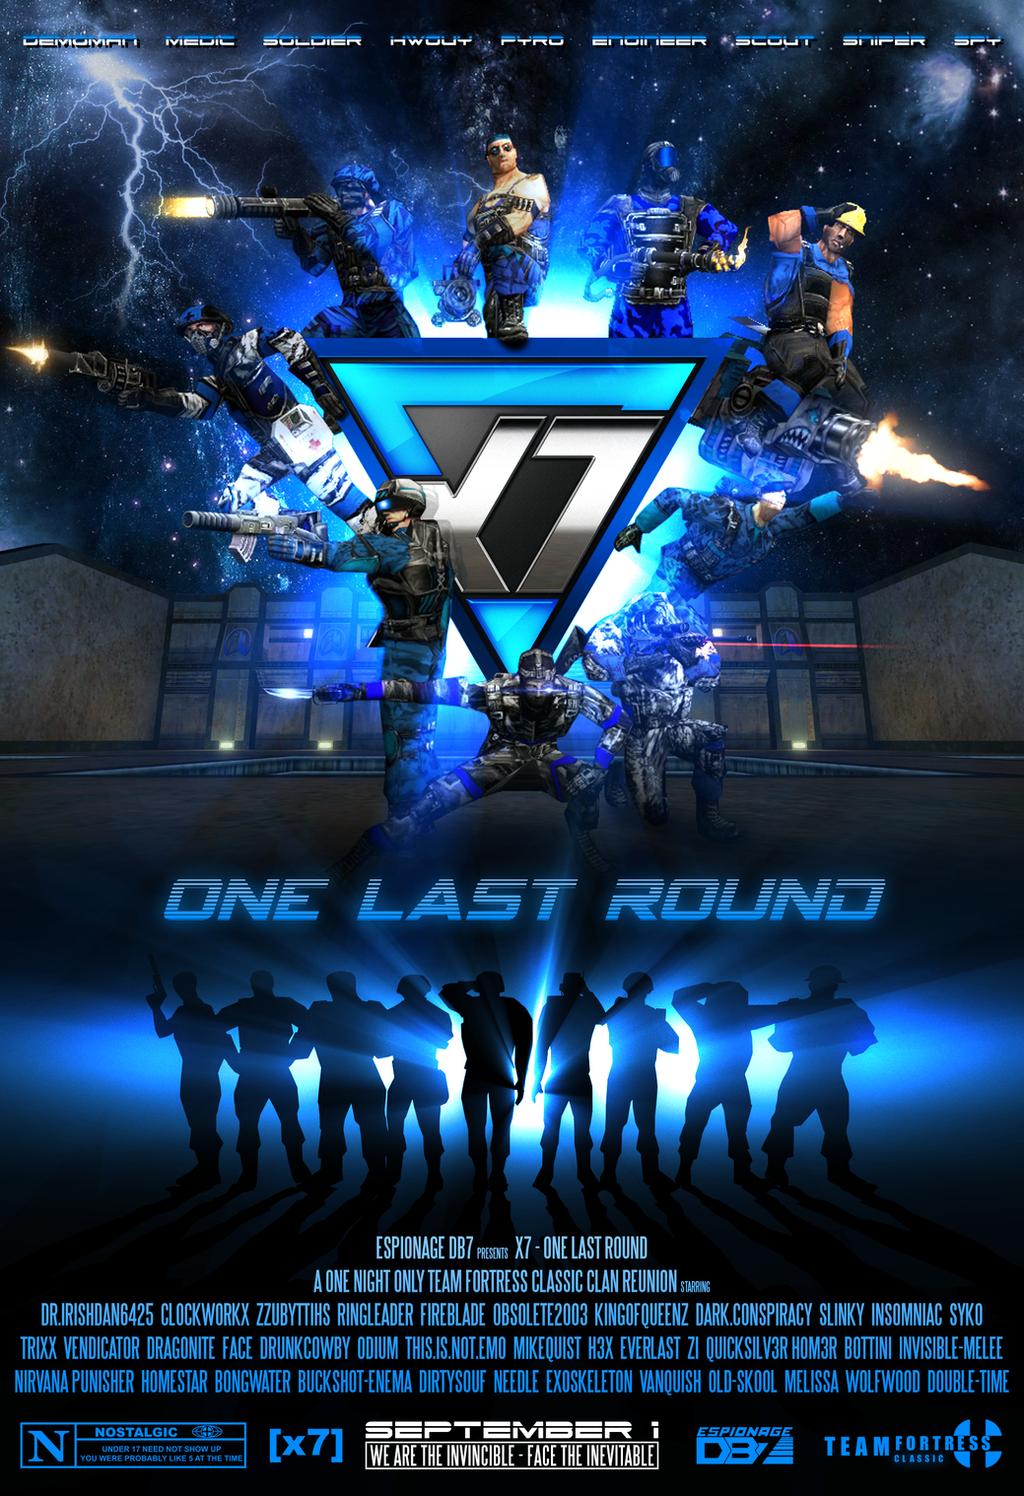 [x7] One Last Round - Movie Poster by EspionageDB7